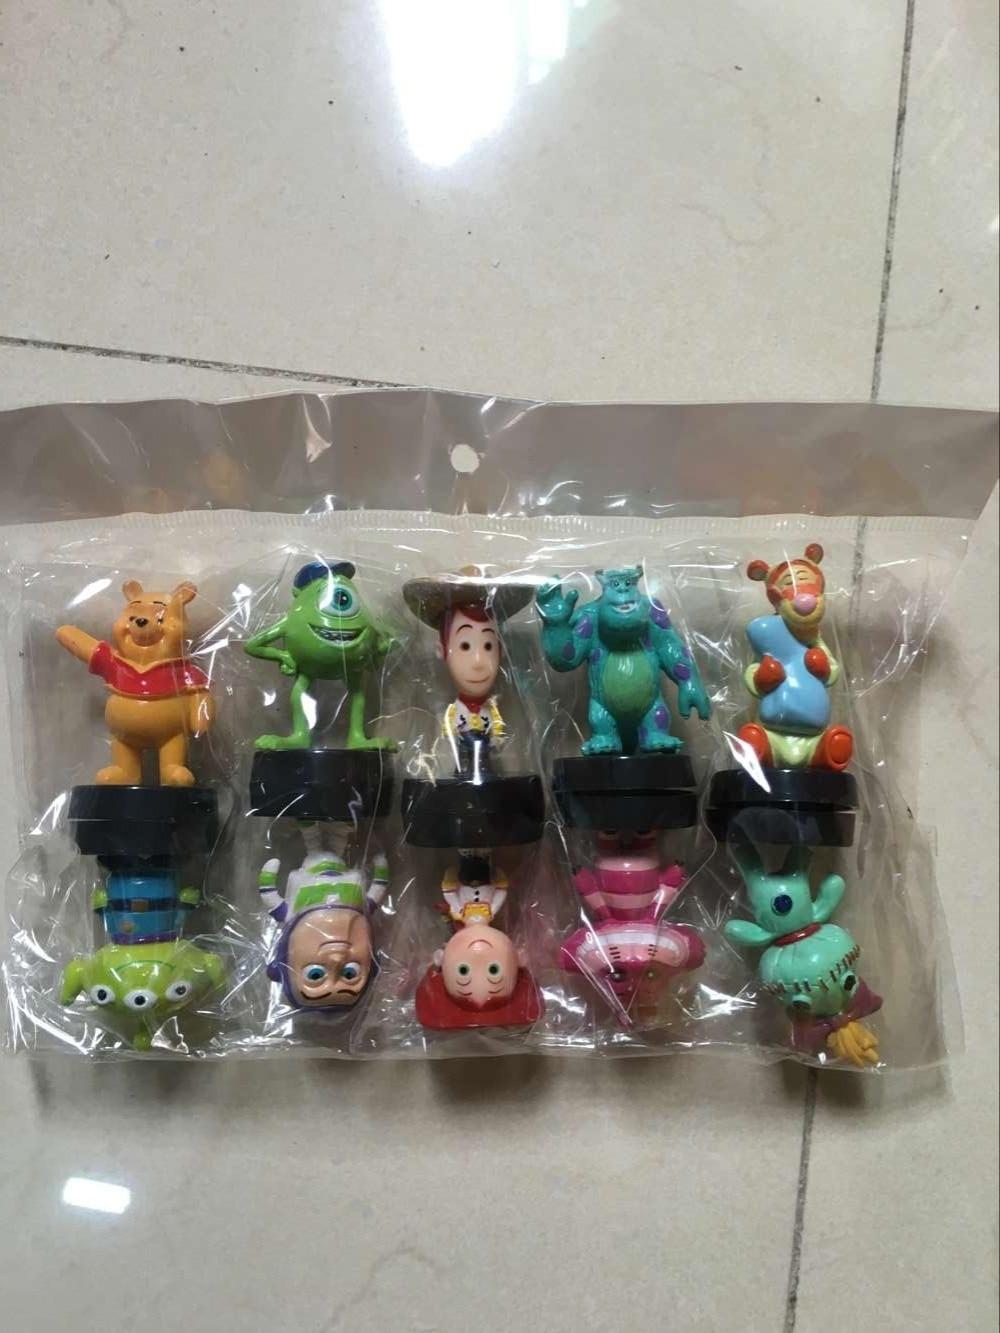 Free Shipping Anime Cartoon Toy Story 3 Buzz Lightyear Woody Mini PVC Figure Toys Dolls Child Toys Gifts 10pcs/set DSFG133 free shipping toy story 3 sheriff woody posable figure retail box t 020